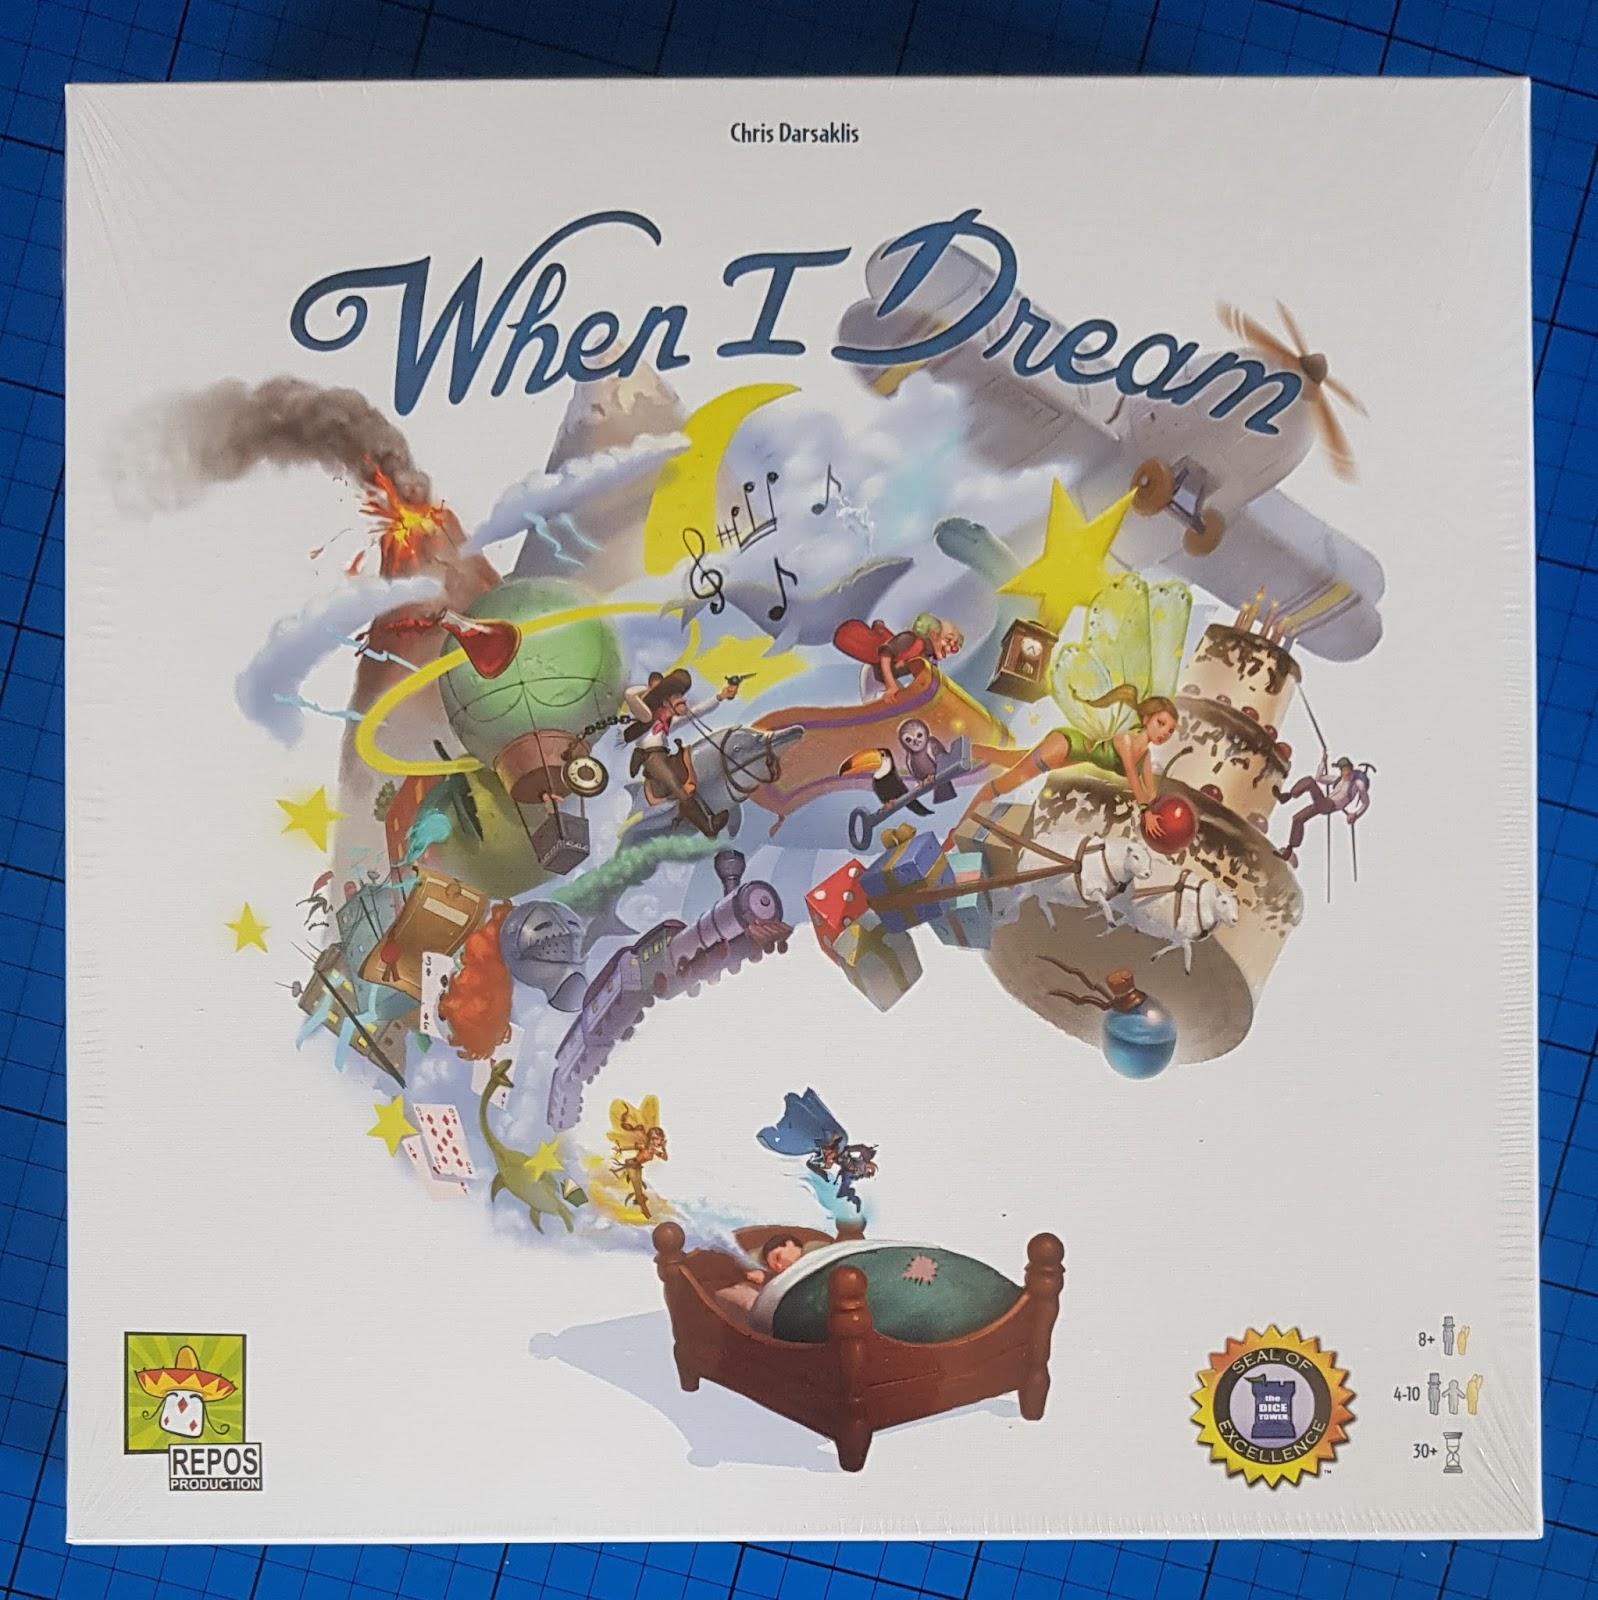 The Brick Castle: When I Dream by Chris Darsarkalis Family